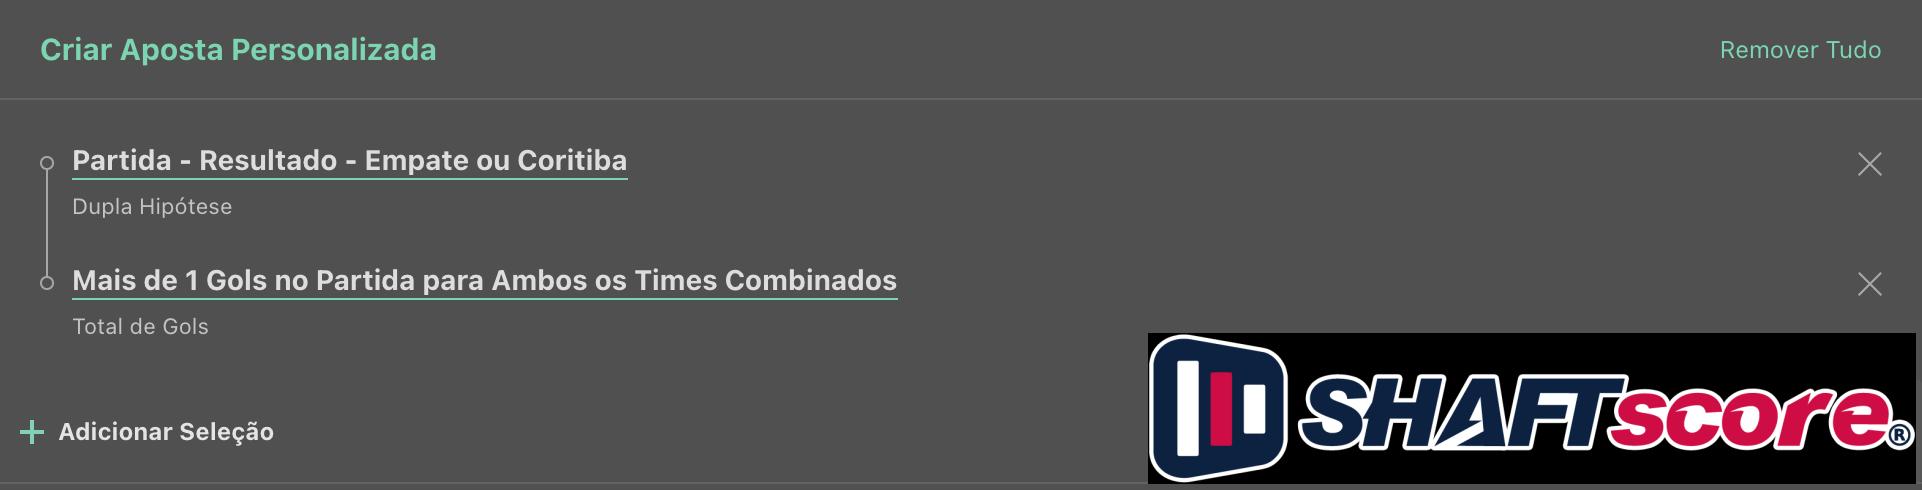 Bilhete pronto, palpite hoje Remo Coritiba, aposta dupla bet365.